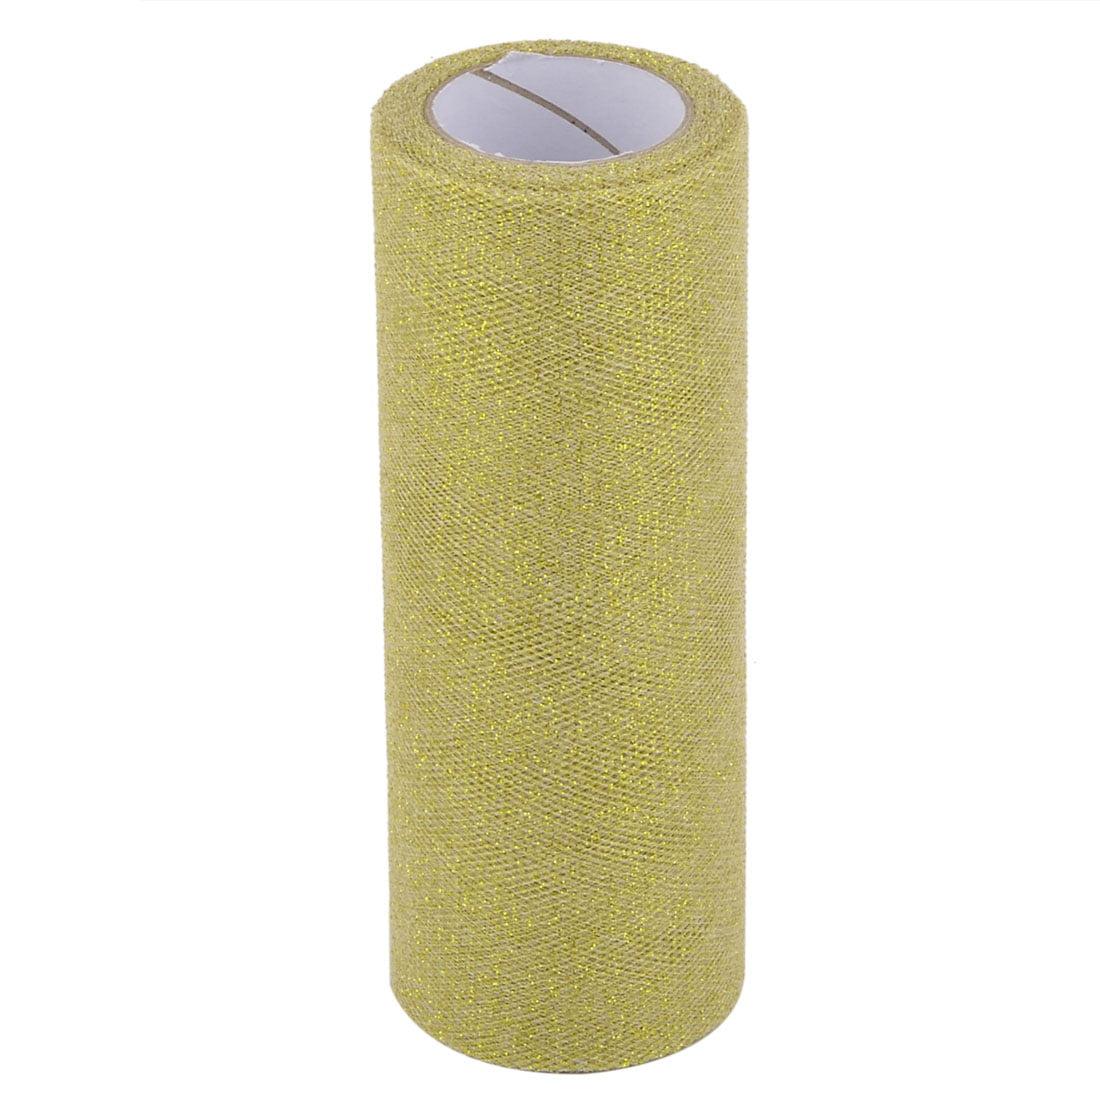 "Accueil Festival Polyester Tutu Emballage cadeau Tulle Rouleau tiroir 5.9"" x 10 Yards - image 5 de 5"